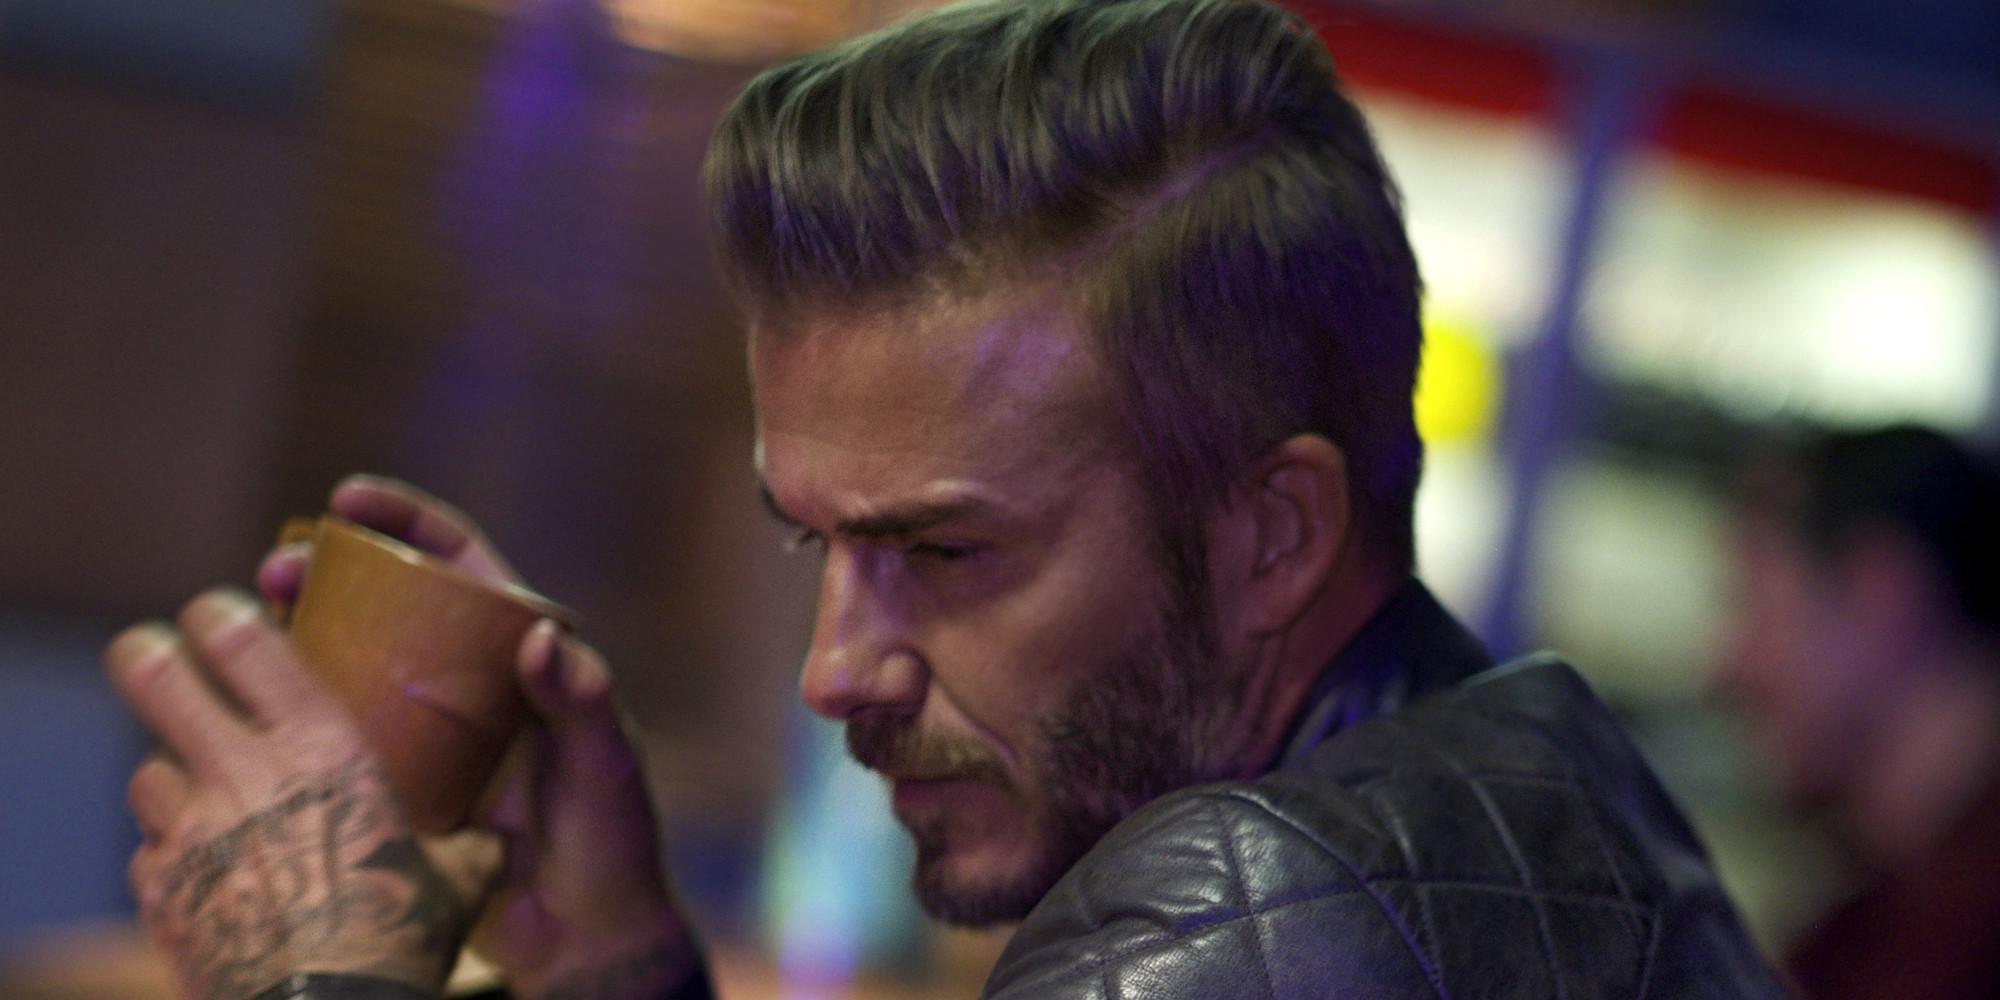 David Beckham Turns Actor In Arty Short Film 'Outlaws' For ... David Beckham Facebook